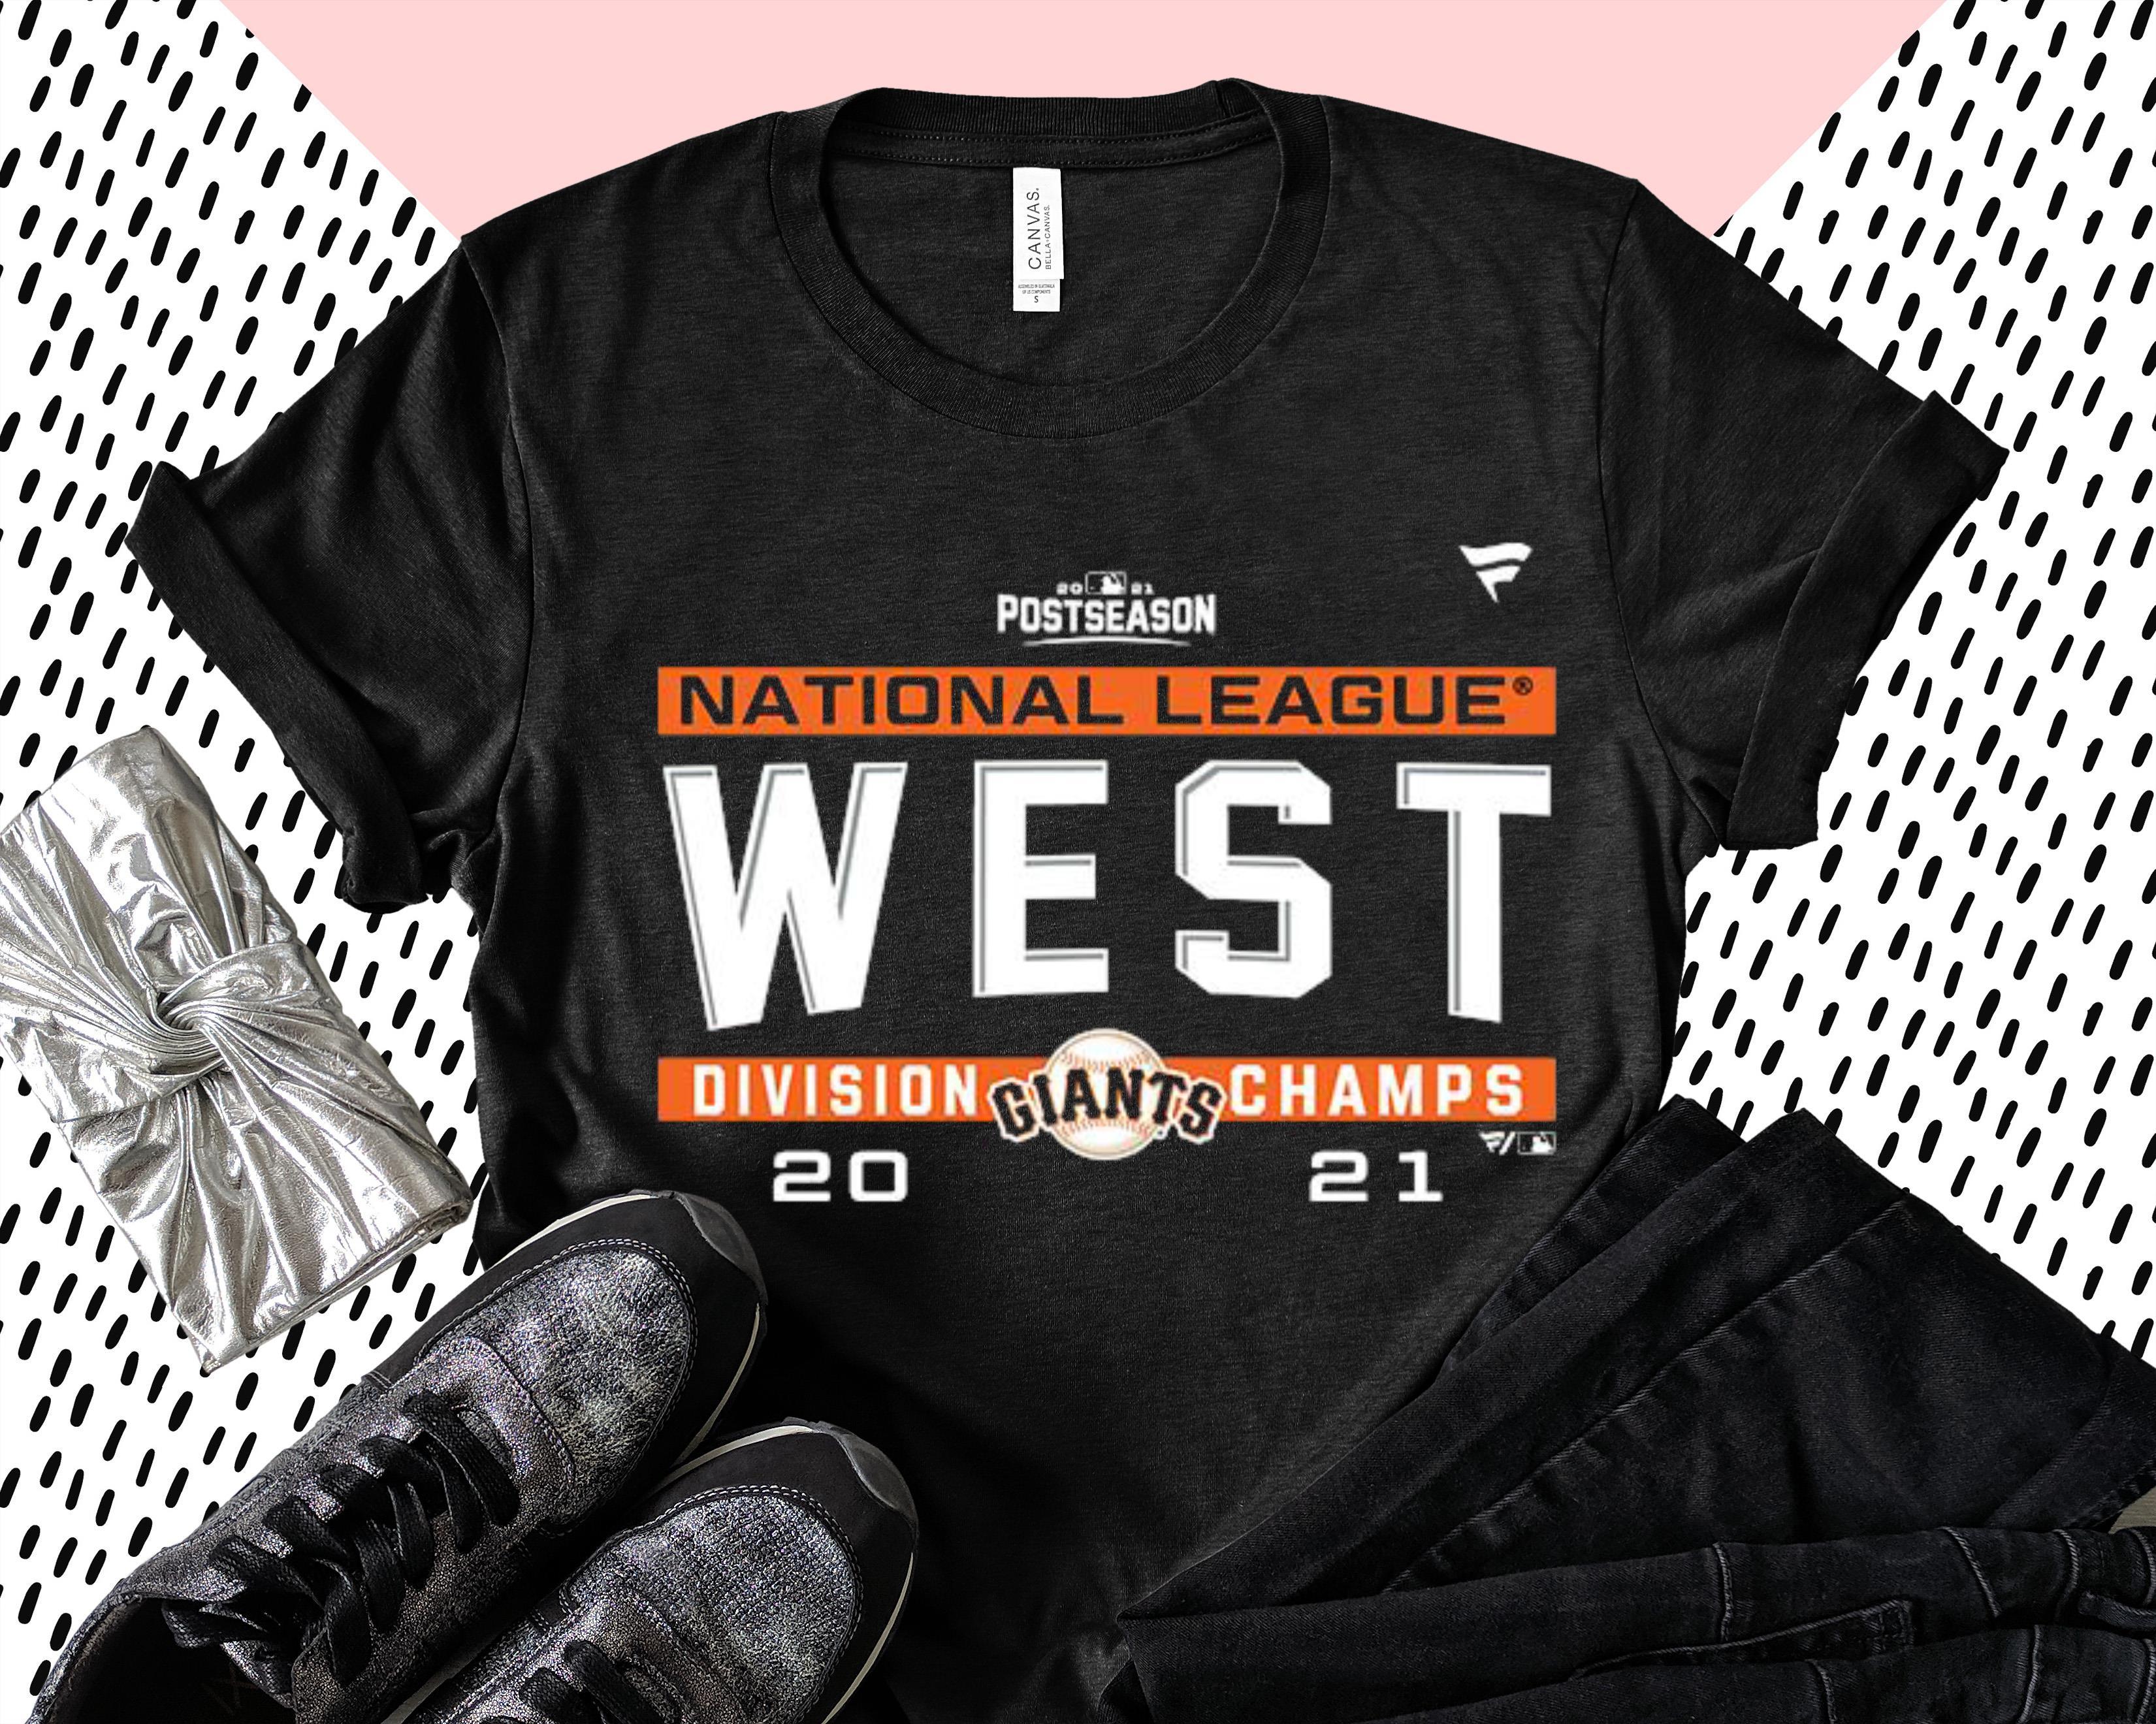 Best MLB San Francisco Giants NL West Division Champs 2021 Shirt